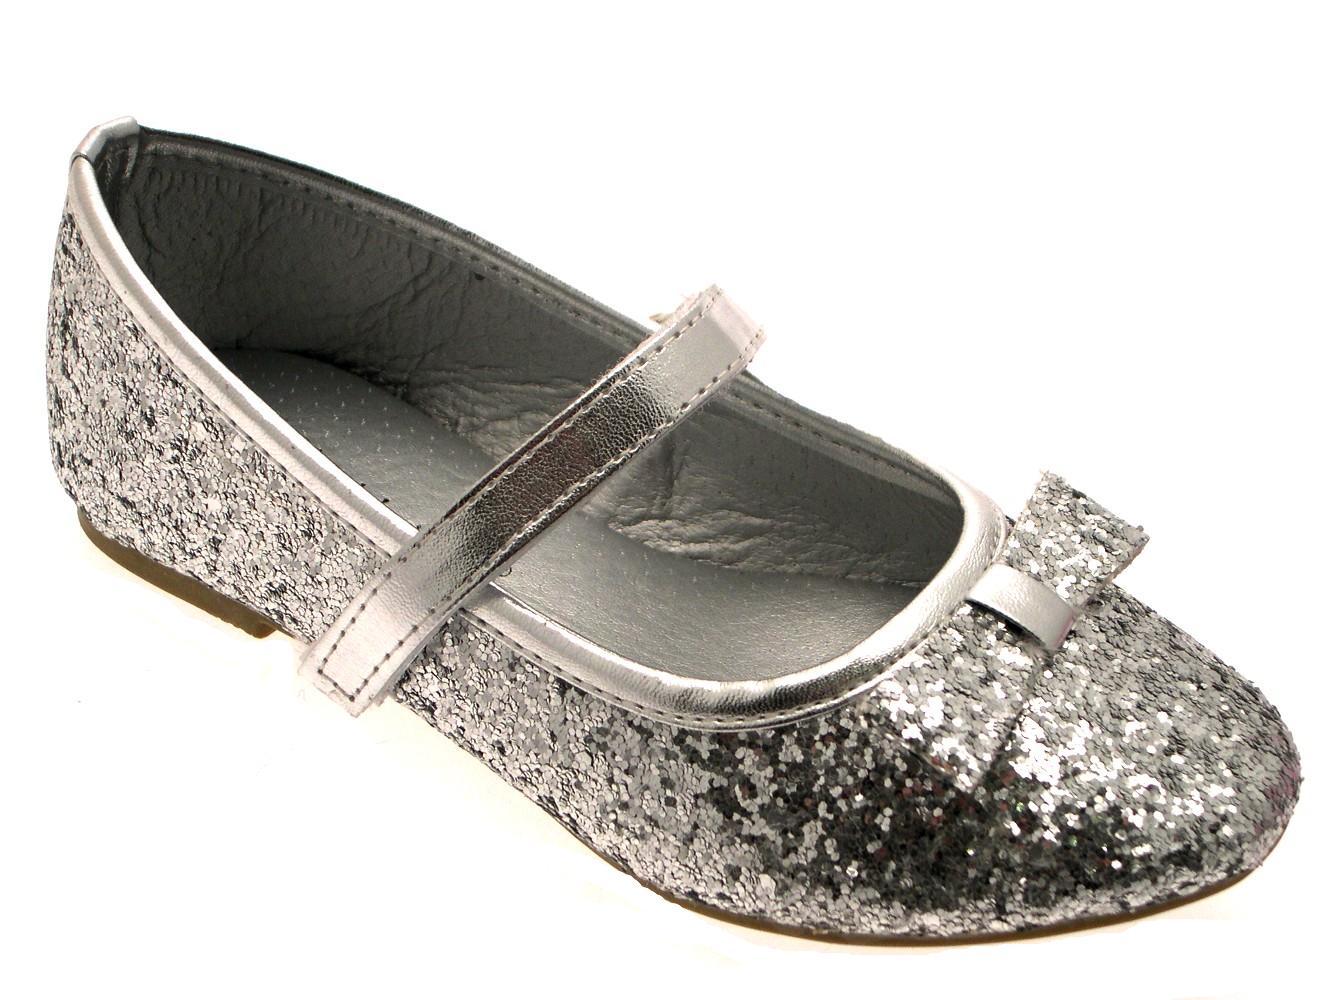 Girls glitter bow ballet pumps flat childrens kids shoes wedding party